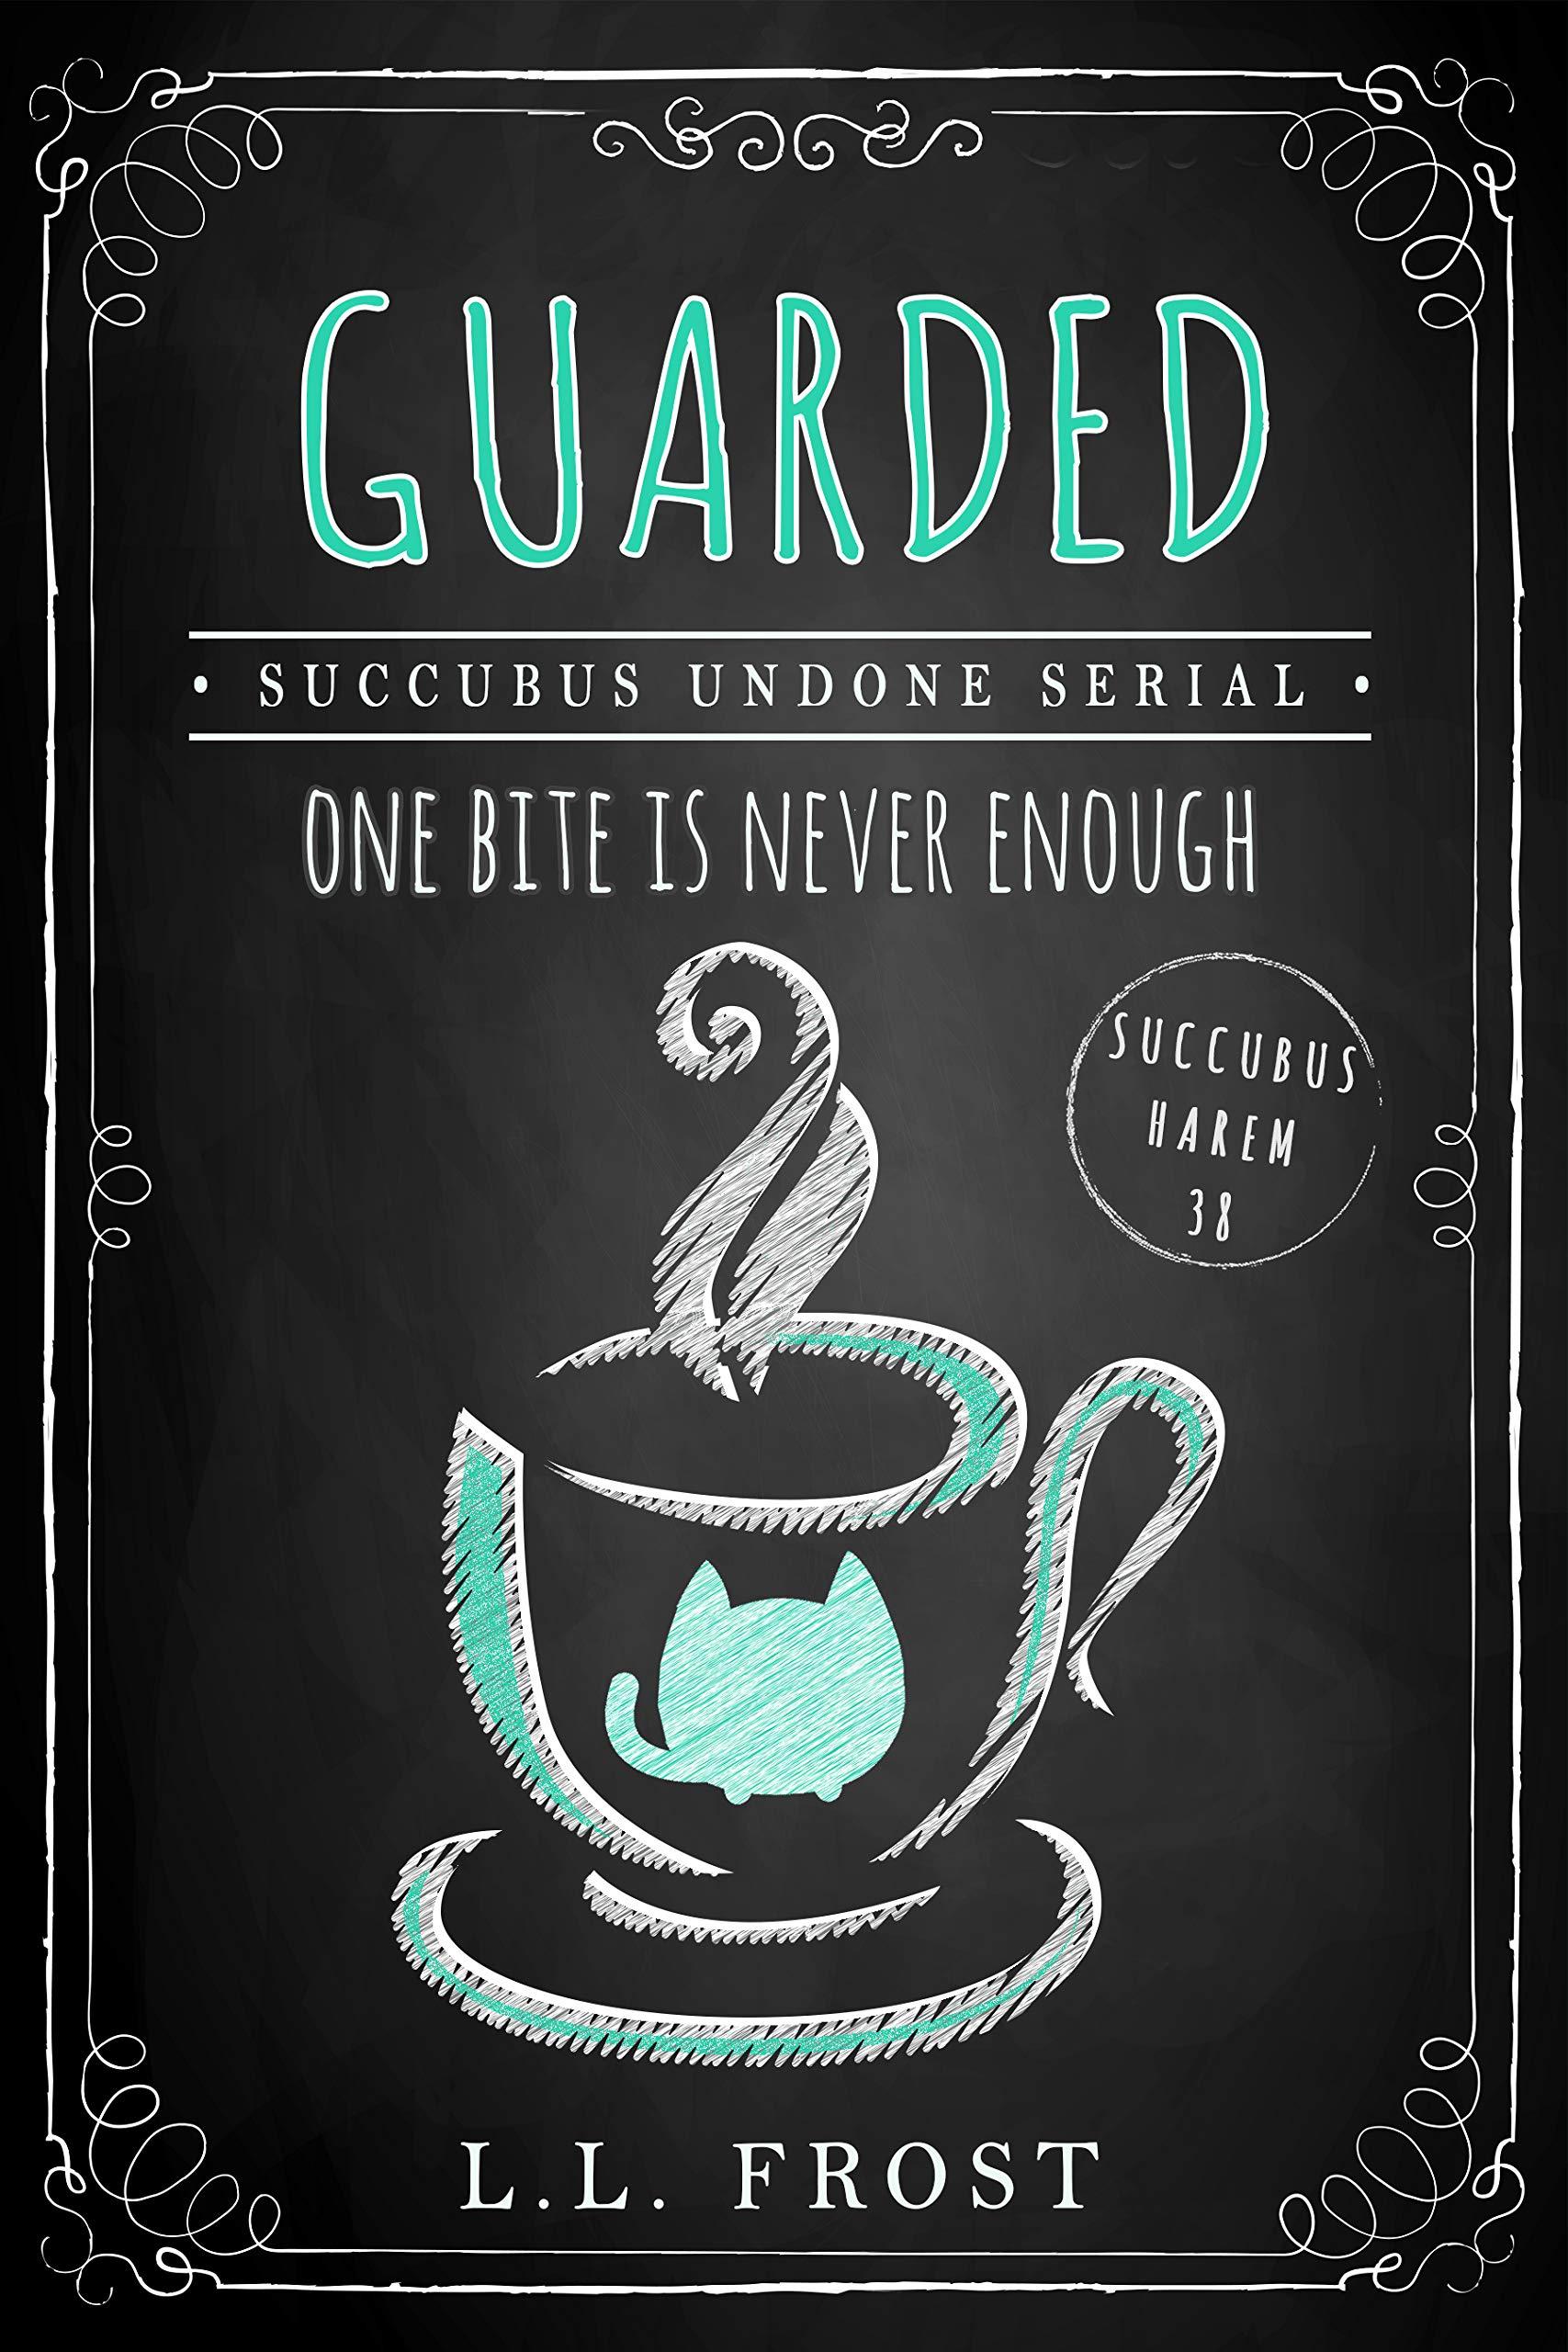 Guarded: Succubus Undone Serial (Succubus Harem Book 38)